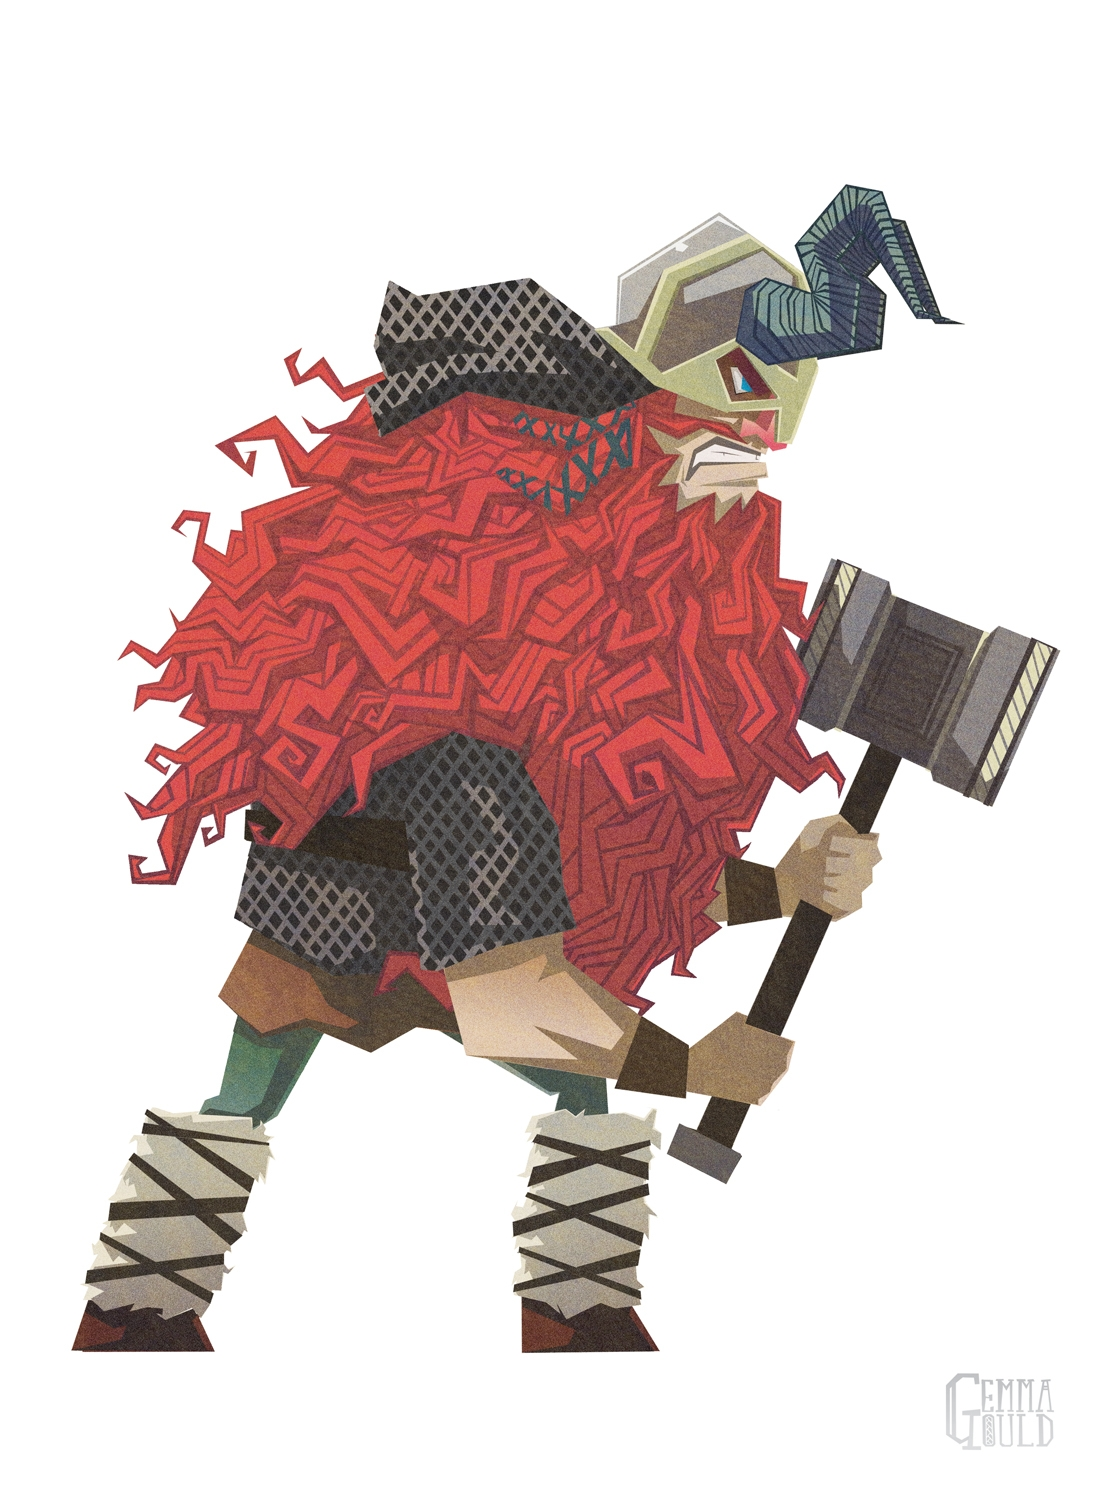 Norse god Thor - thor, norse, norsemythology - gemmagould | ello